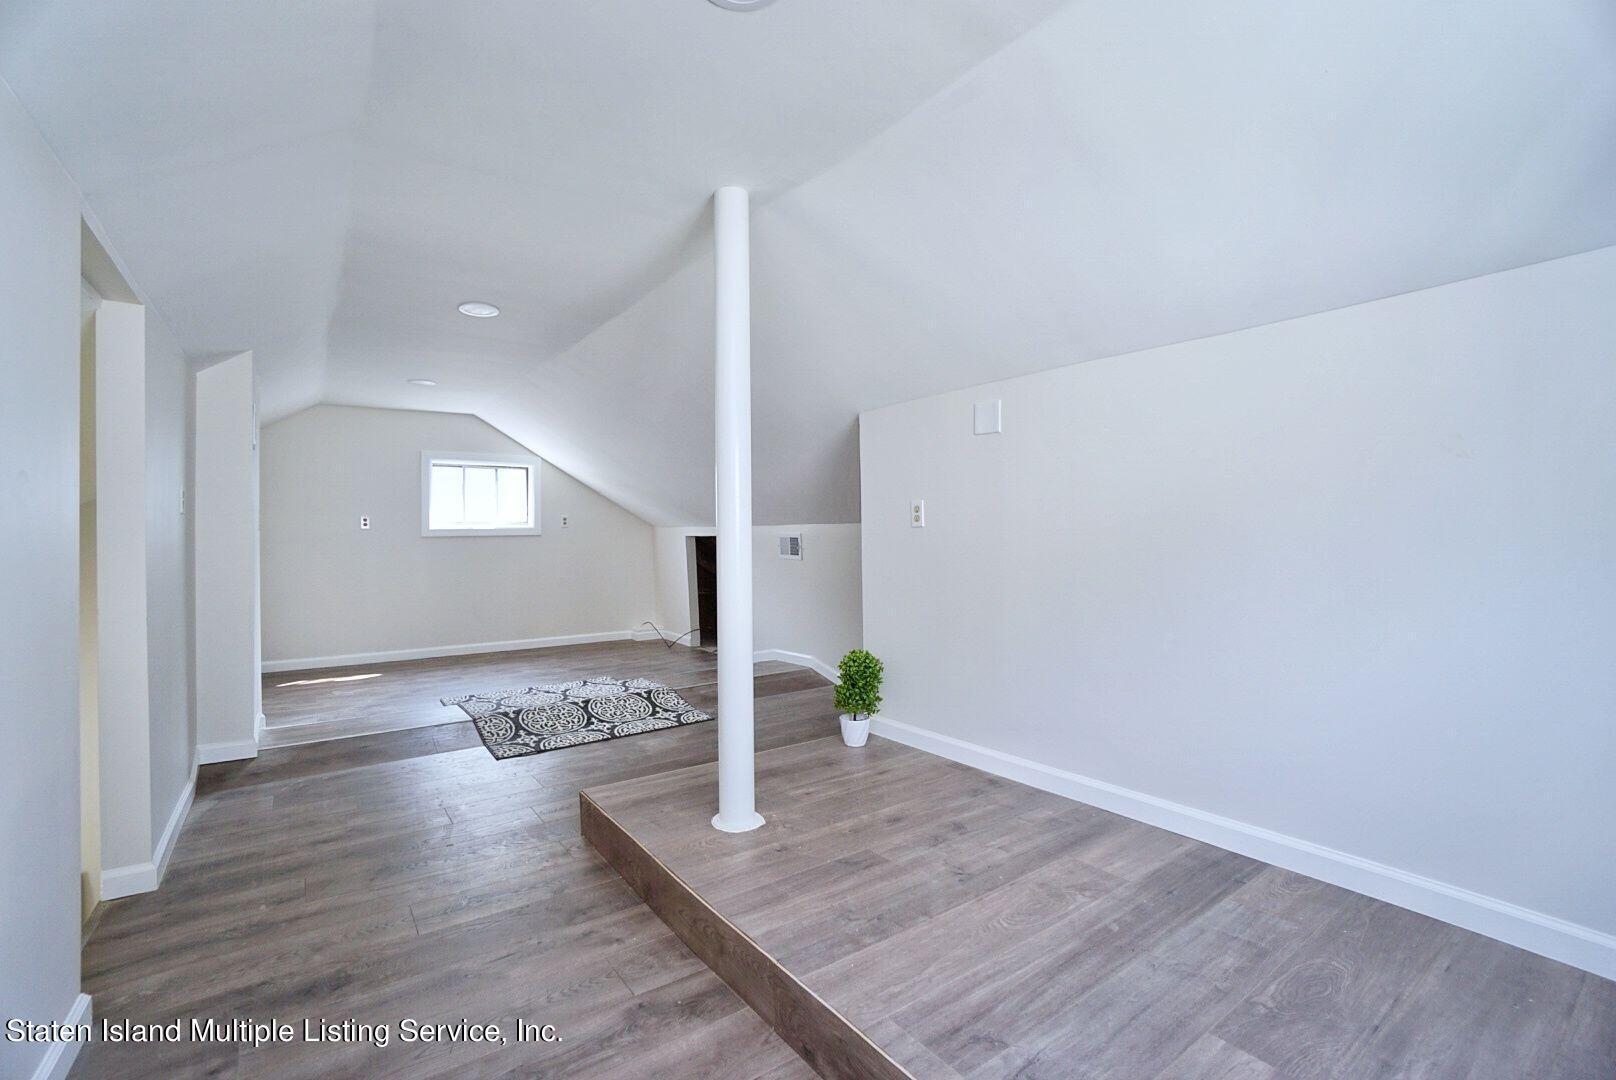 Single Family - Detached 83 Boylan Street  Staten Island, NY 10312, MLS-1149266-21